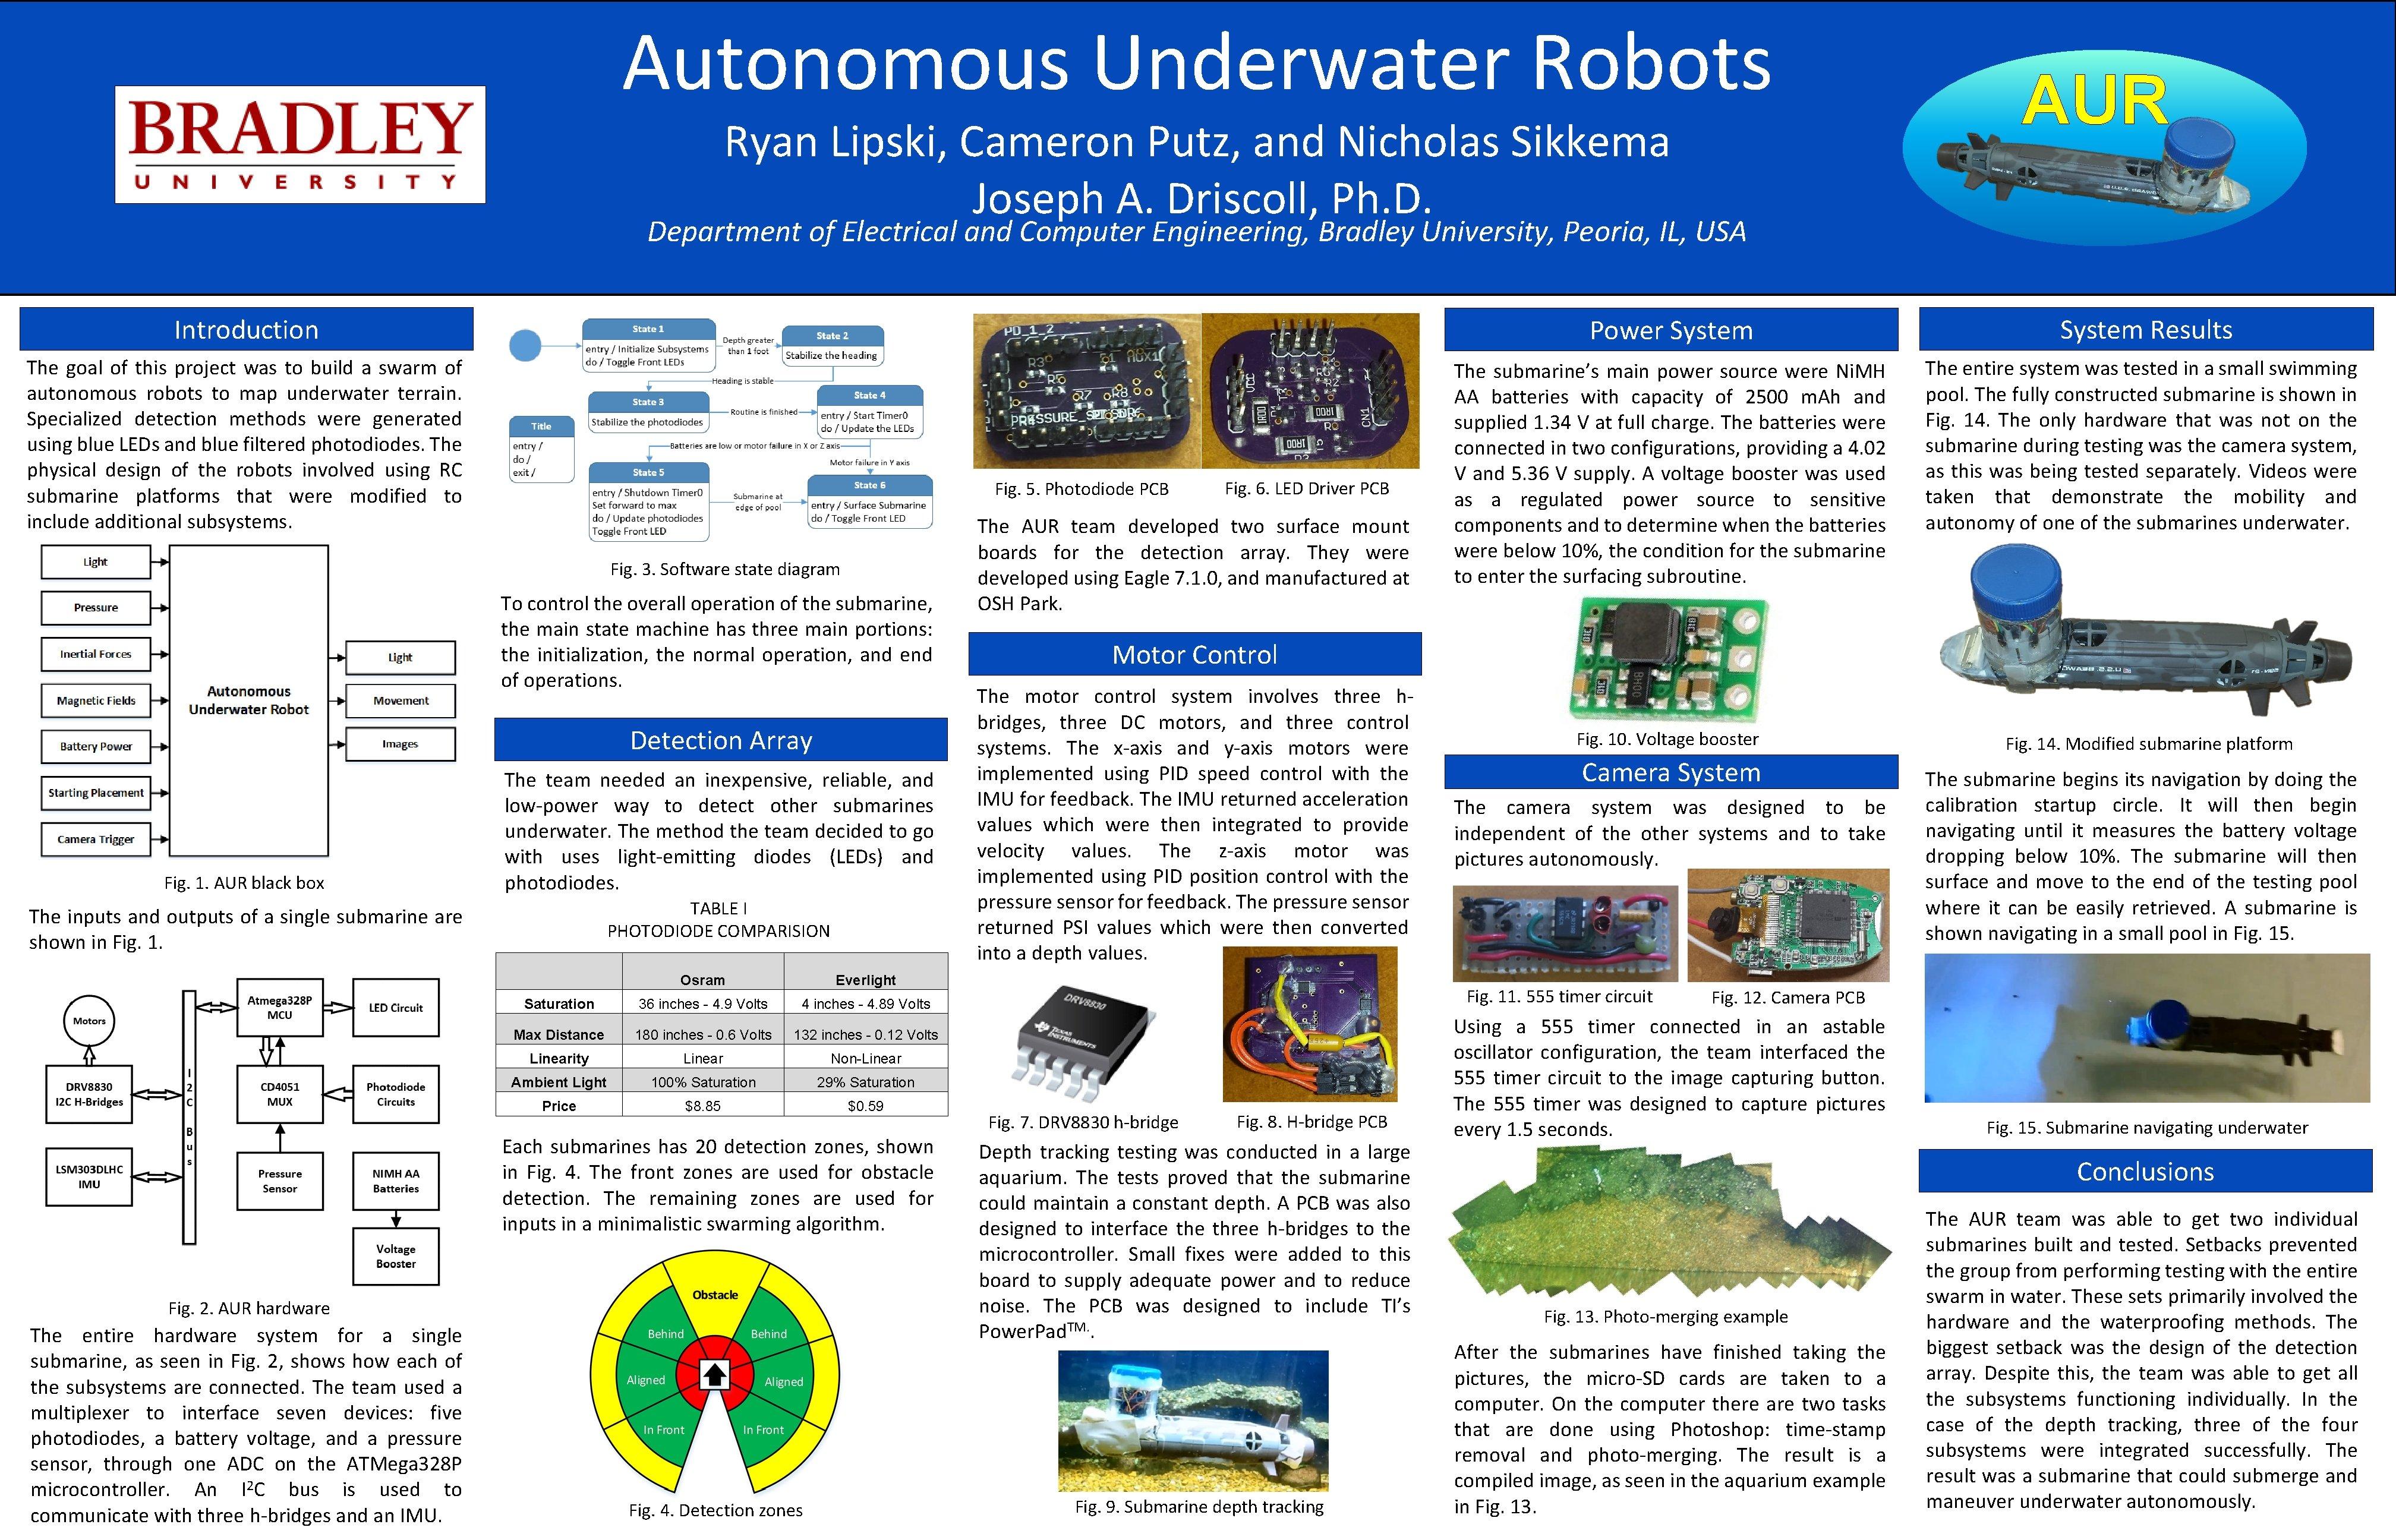 Autonomous Underwater Robots Ryan Lipski, Cameron Putz, and Nicholas Sikkema Joseph A. Driscoll, Ph.